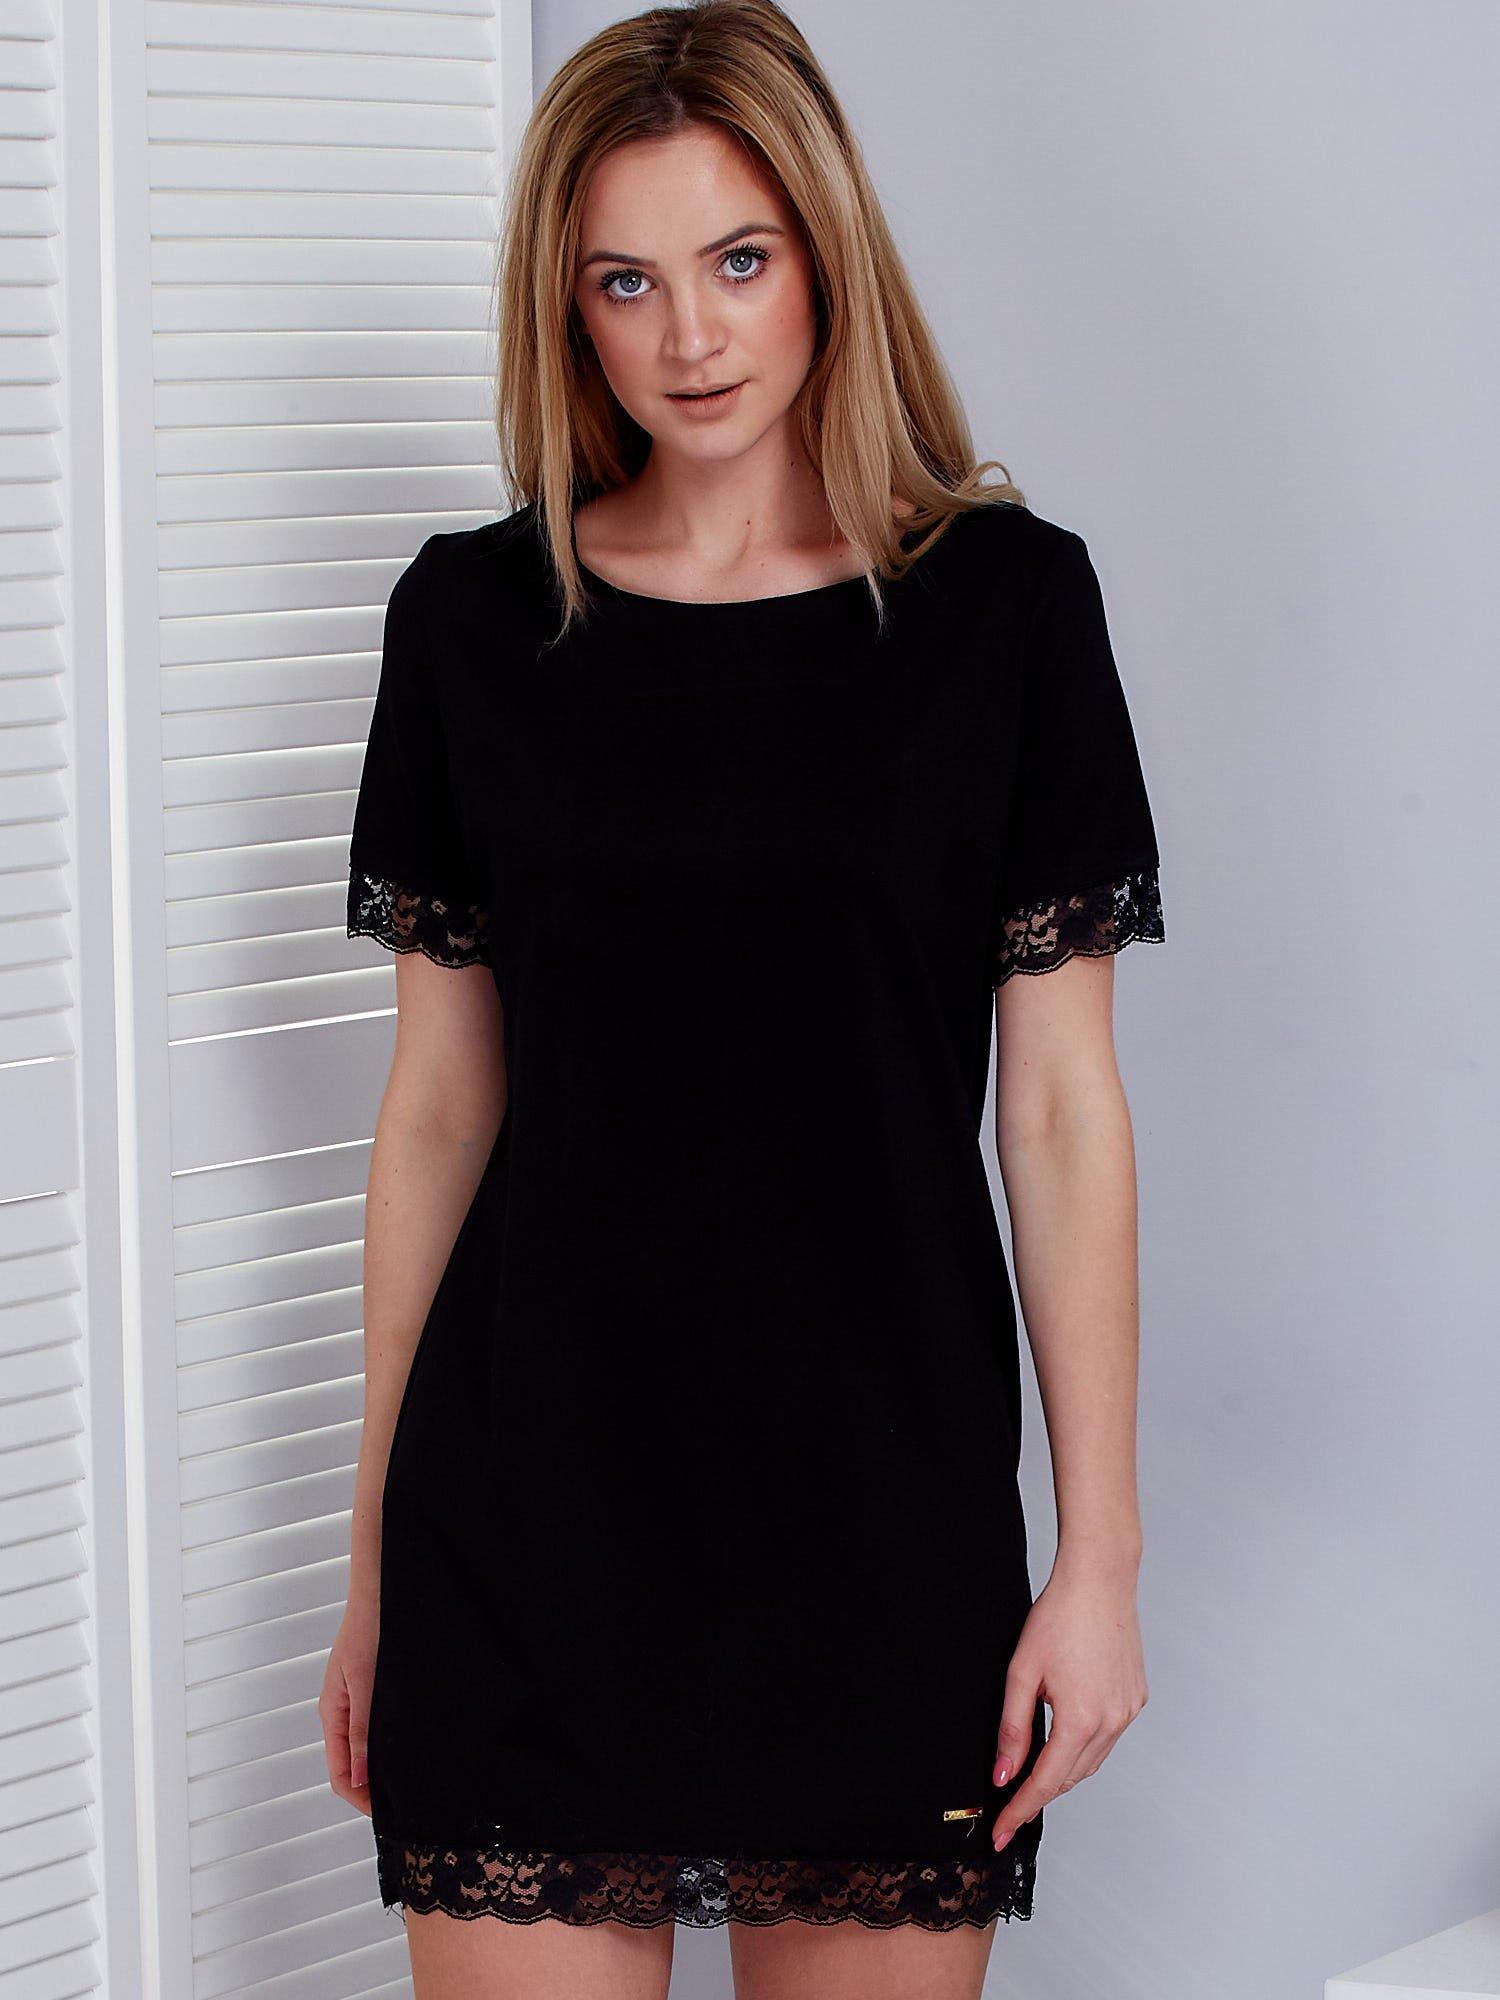 16013696ba Sukienka damska czarna z koronkową lamówką - Sukienka koktajlowa ...